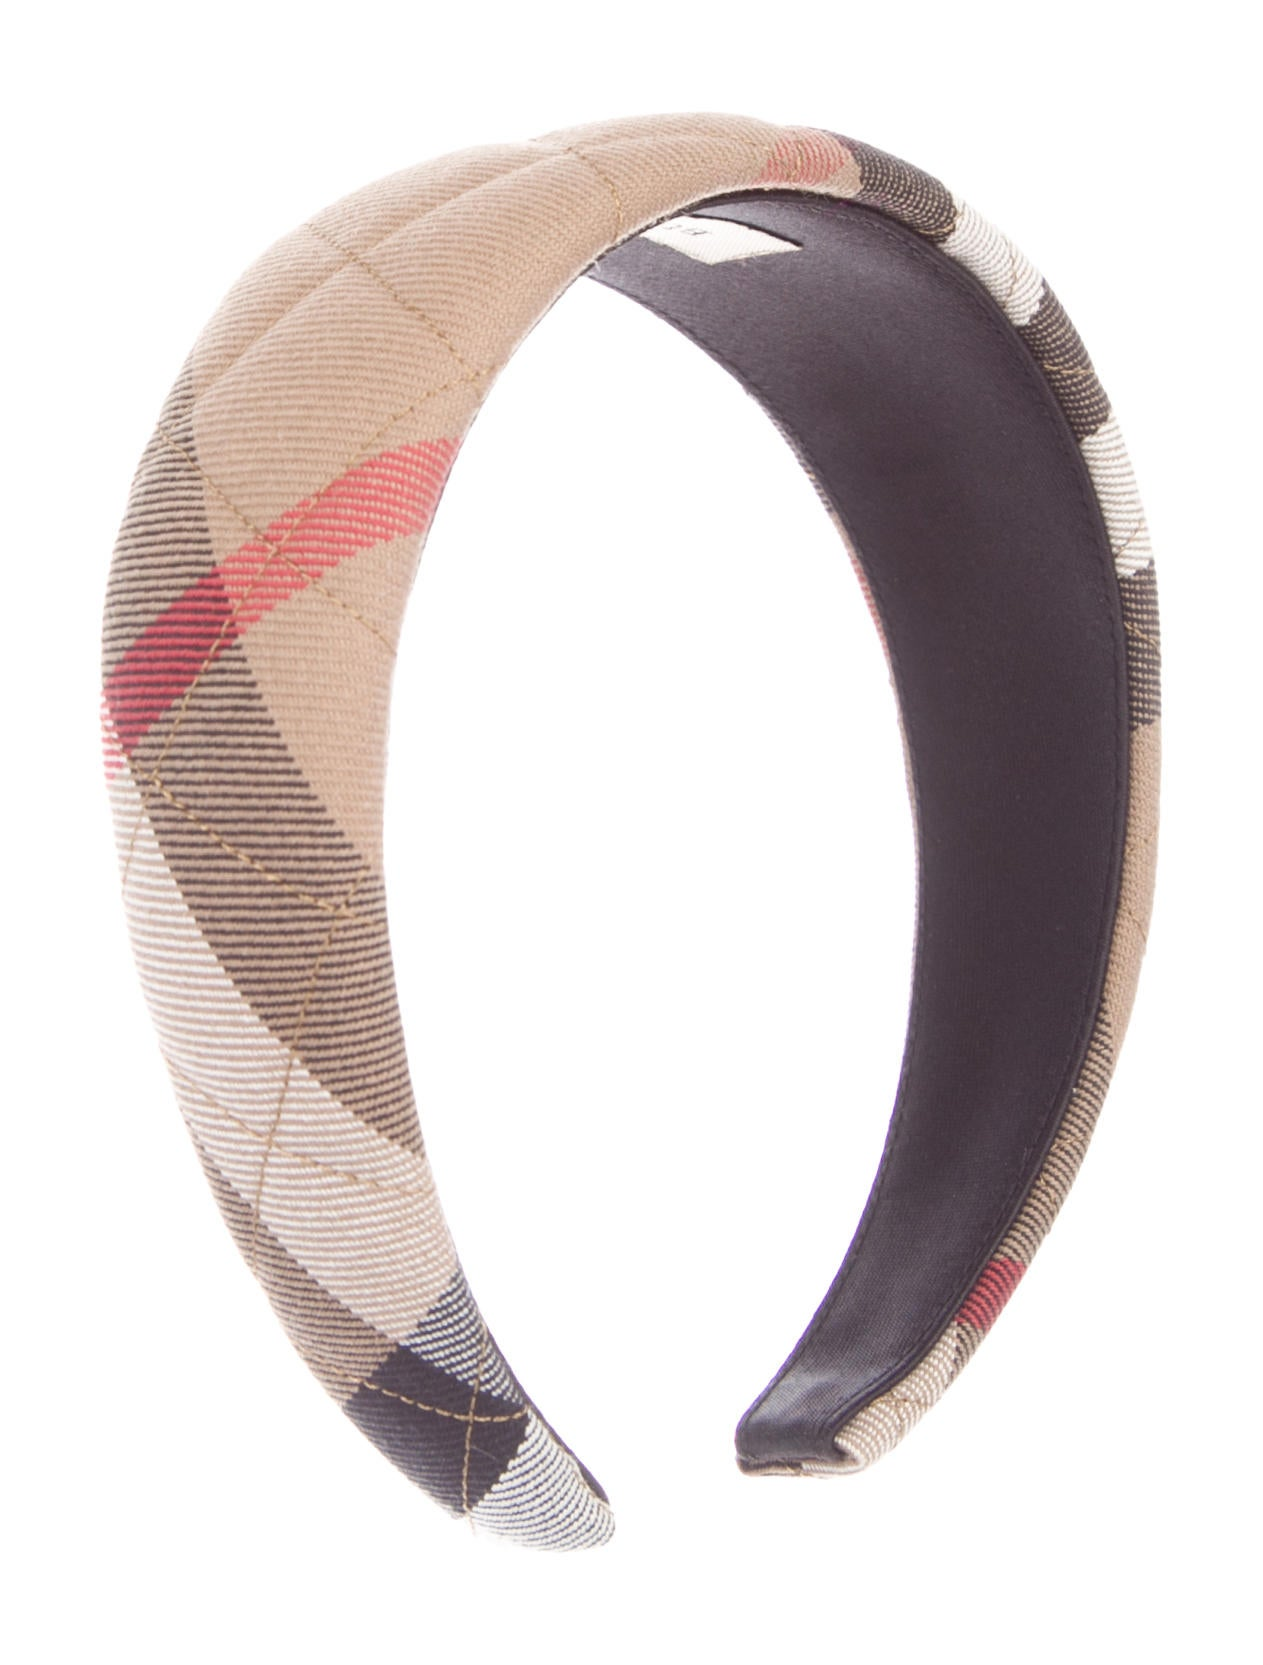 a9a4d508f0f4 Burberry Quilted Nova Check Headband - Accessories - BUR97937   The ...